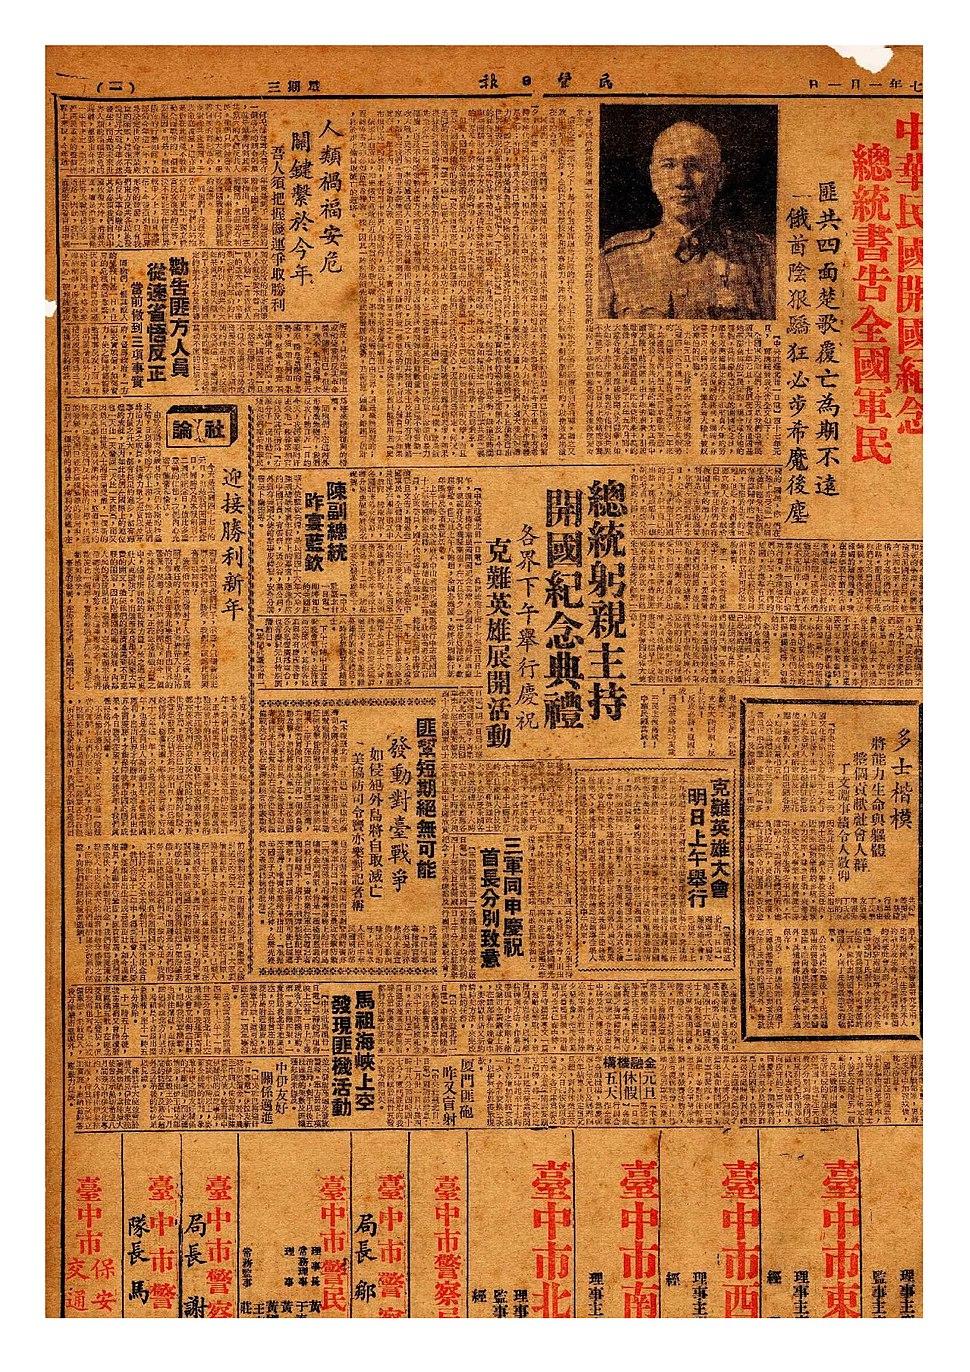 OLDNEWS-TAIWAN-1958